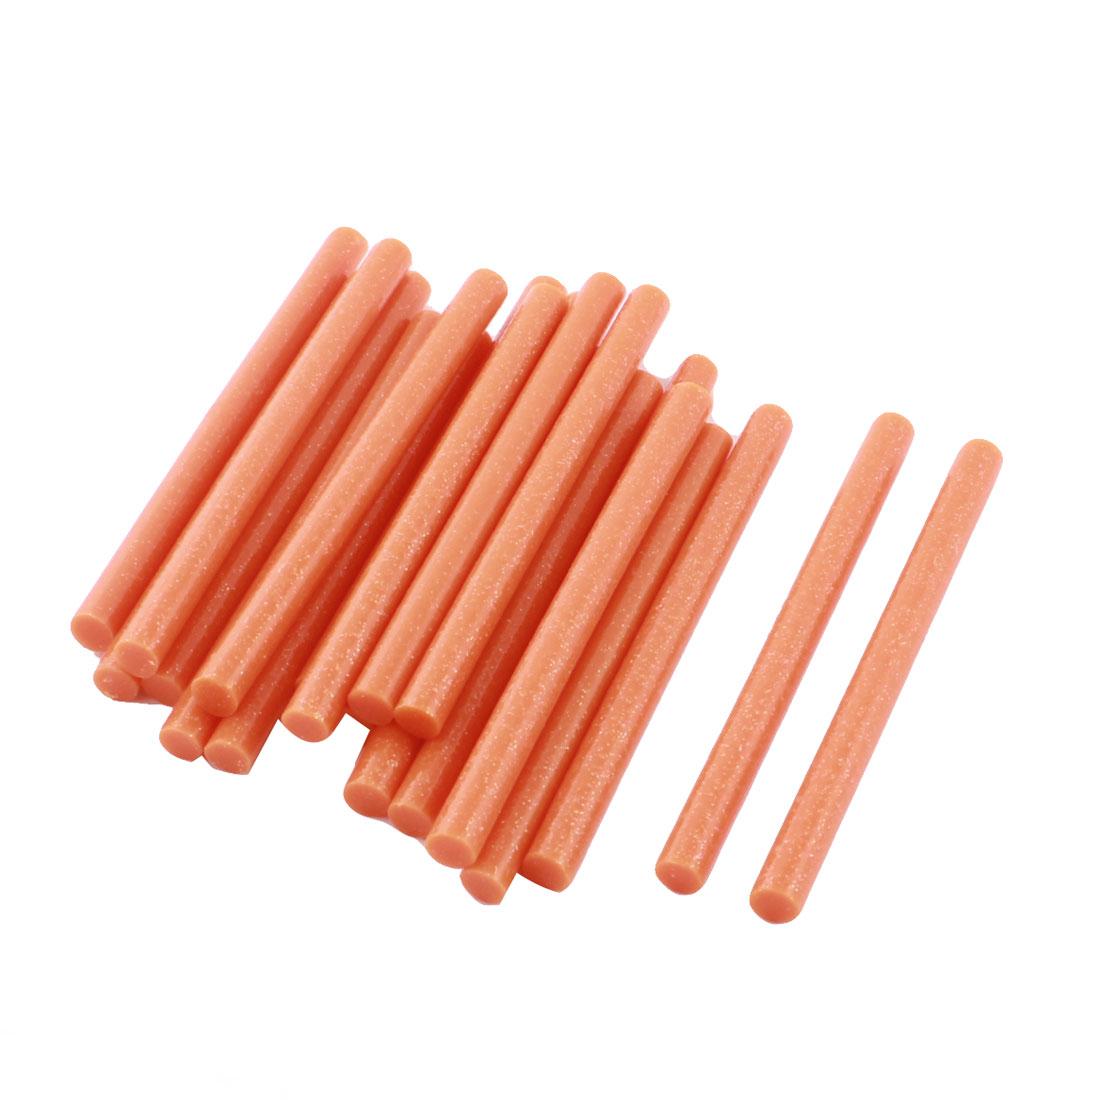 20 Pcs Orange Glitter Hot Melt Glue Gun Adhesive Sticks 7mm x 100mm for Crafting Models